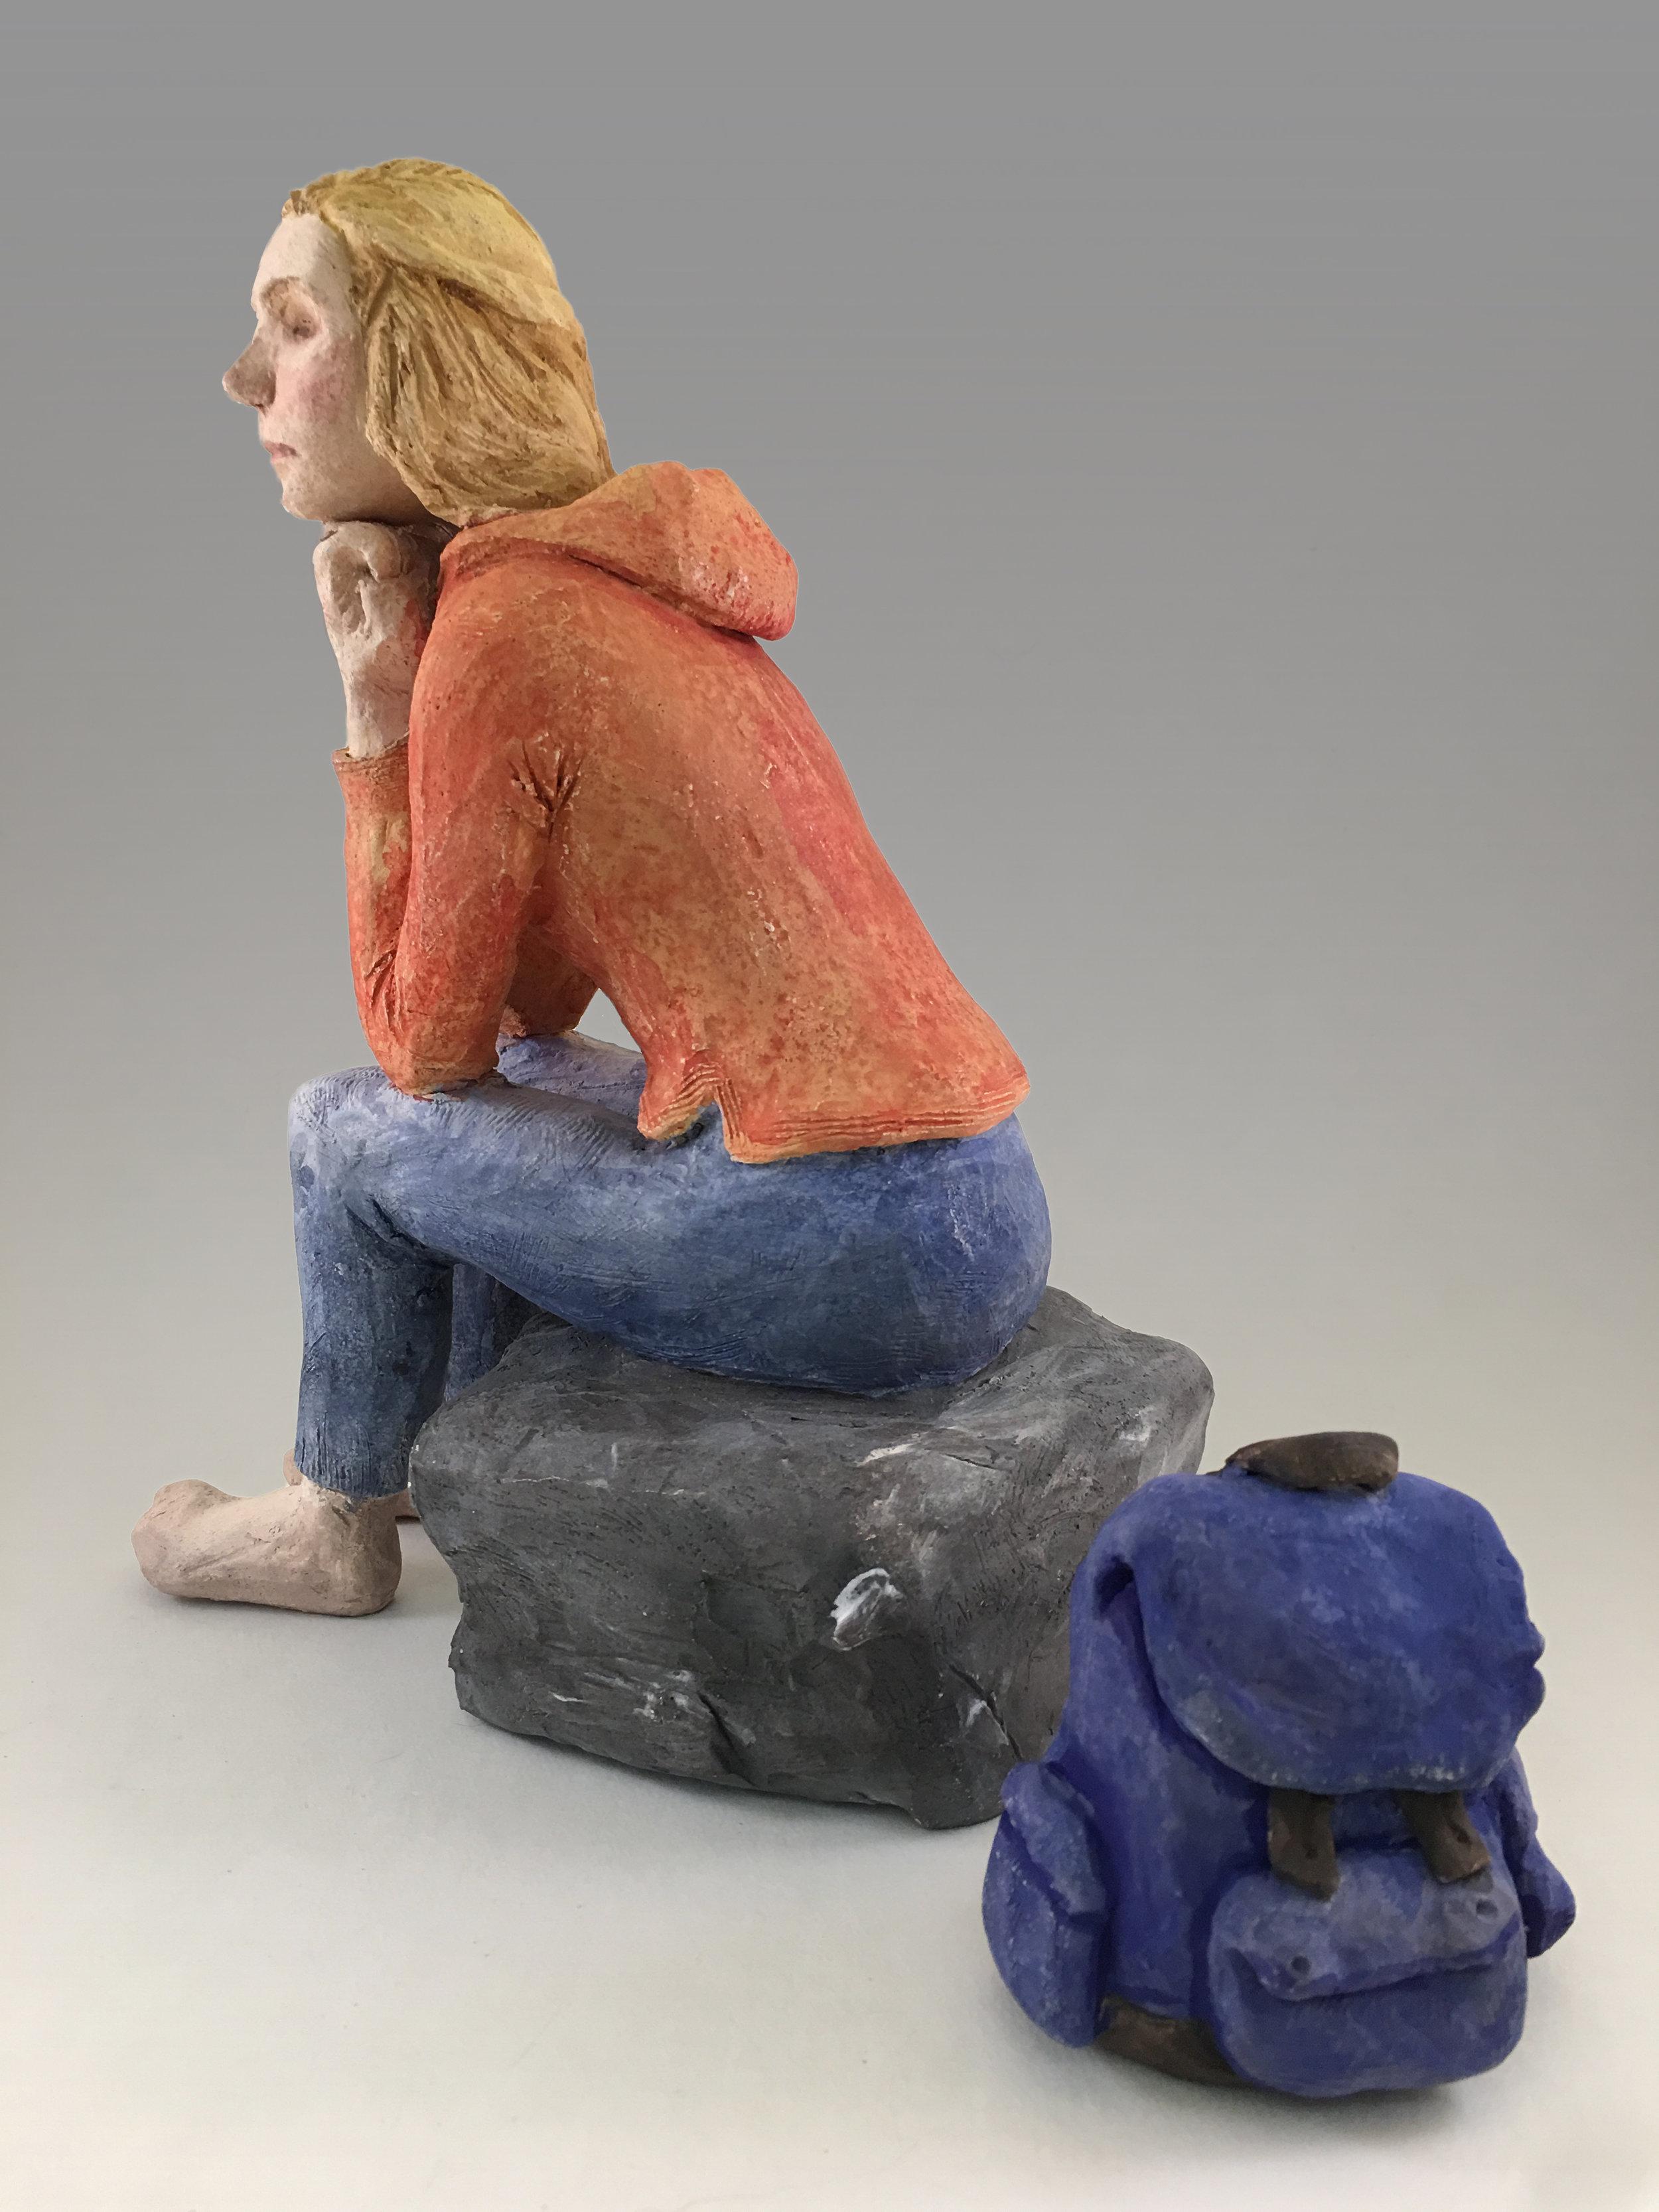 Artistic Merit Award - Congratulation to Jossie for receiving Artistic Merit Award at the 22nd Annual National K-12 Ceramic Exhibition